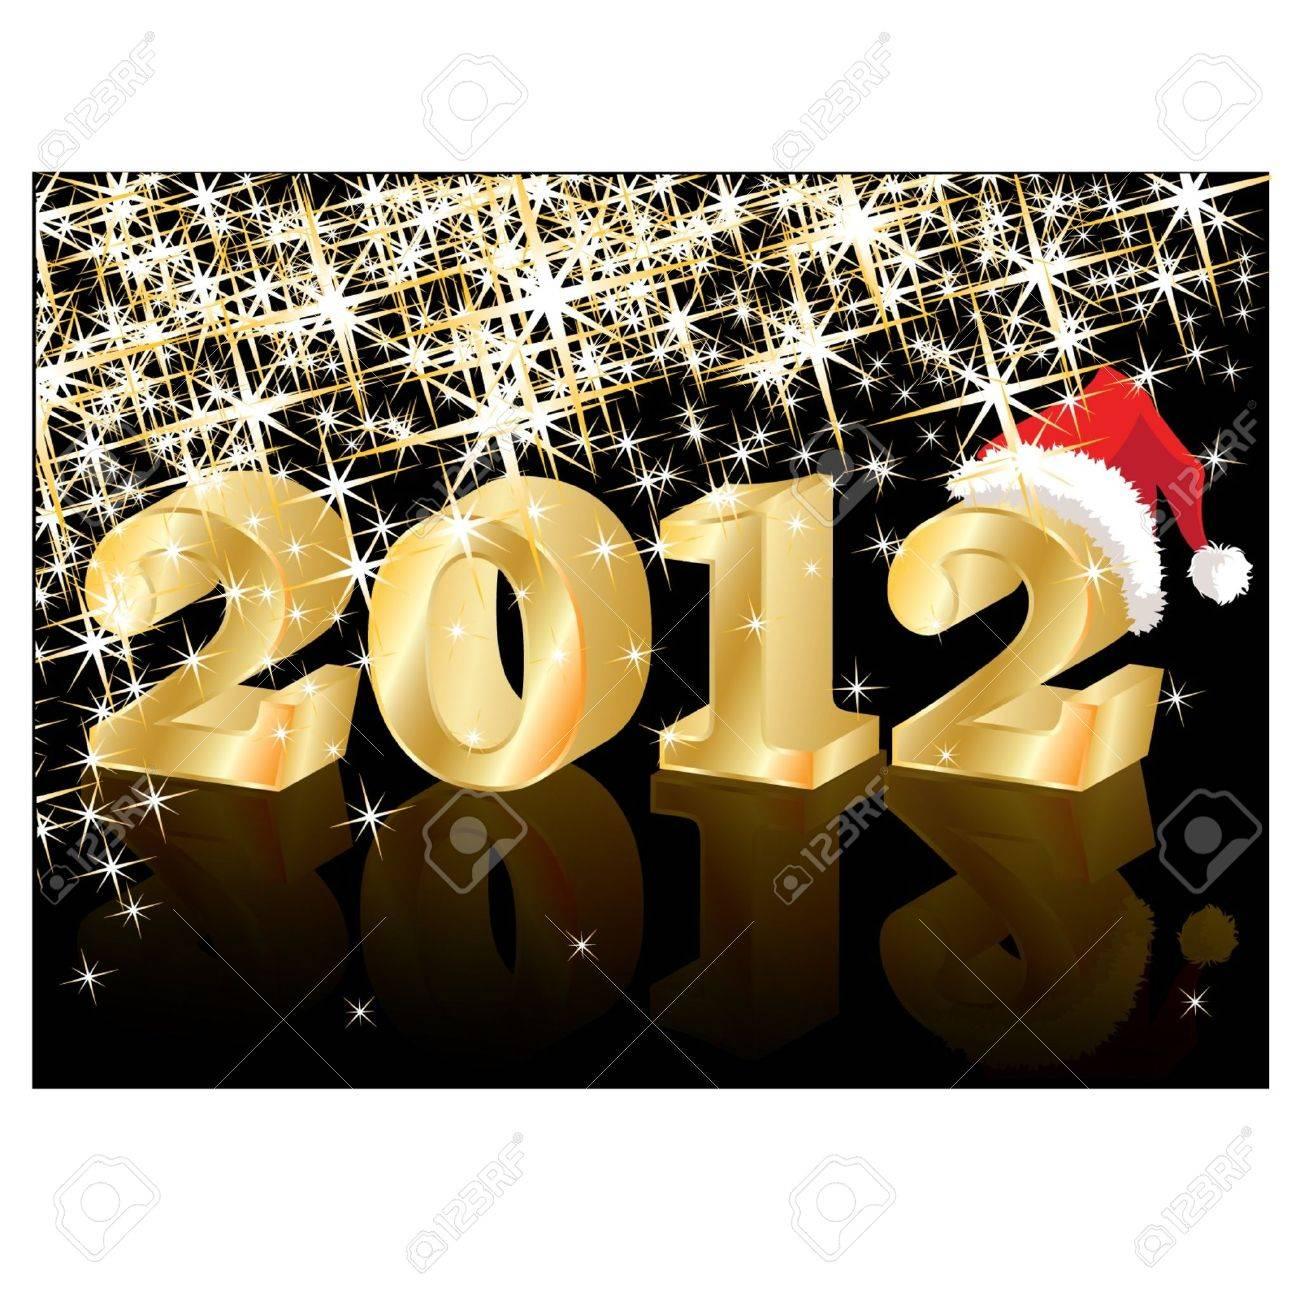 Christmas Greeting Crad, Golden New Year 2012, vector illustration Stock Vector - 10505017